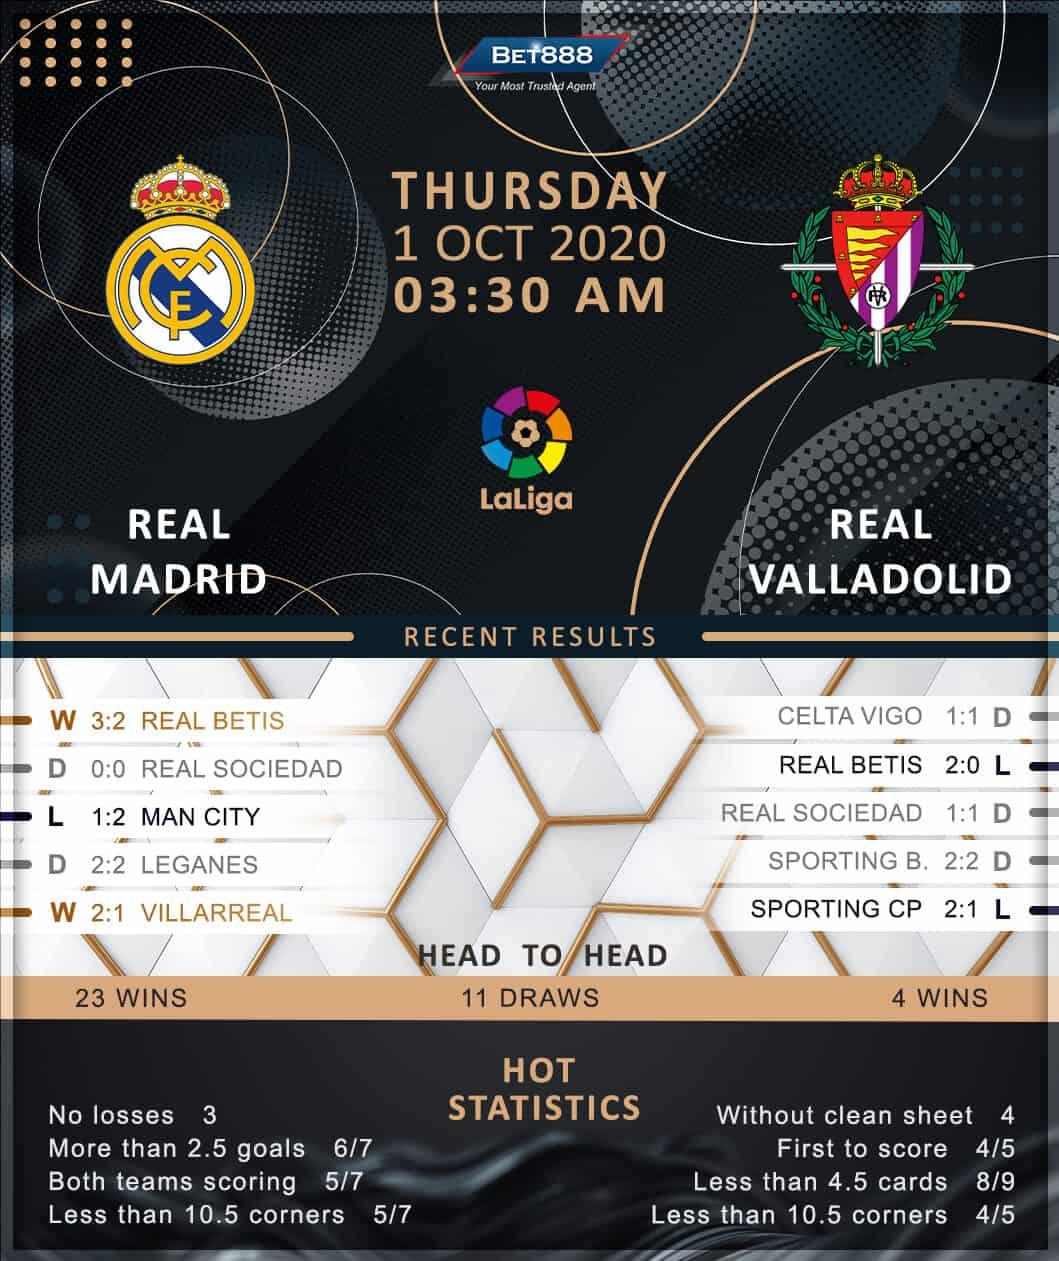 Real Madrid vs Real Valladolid 01/10/20